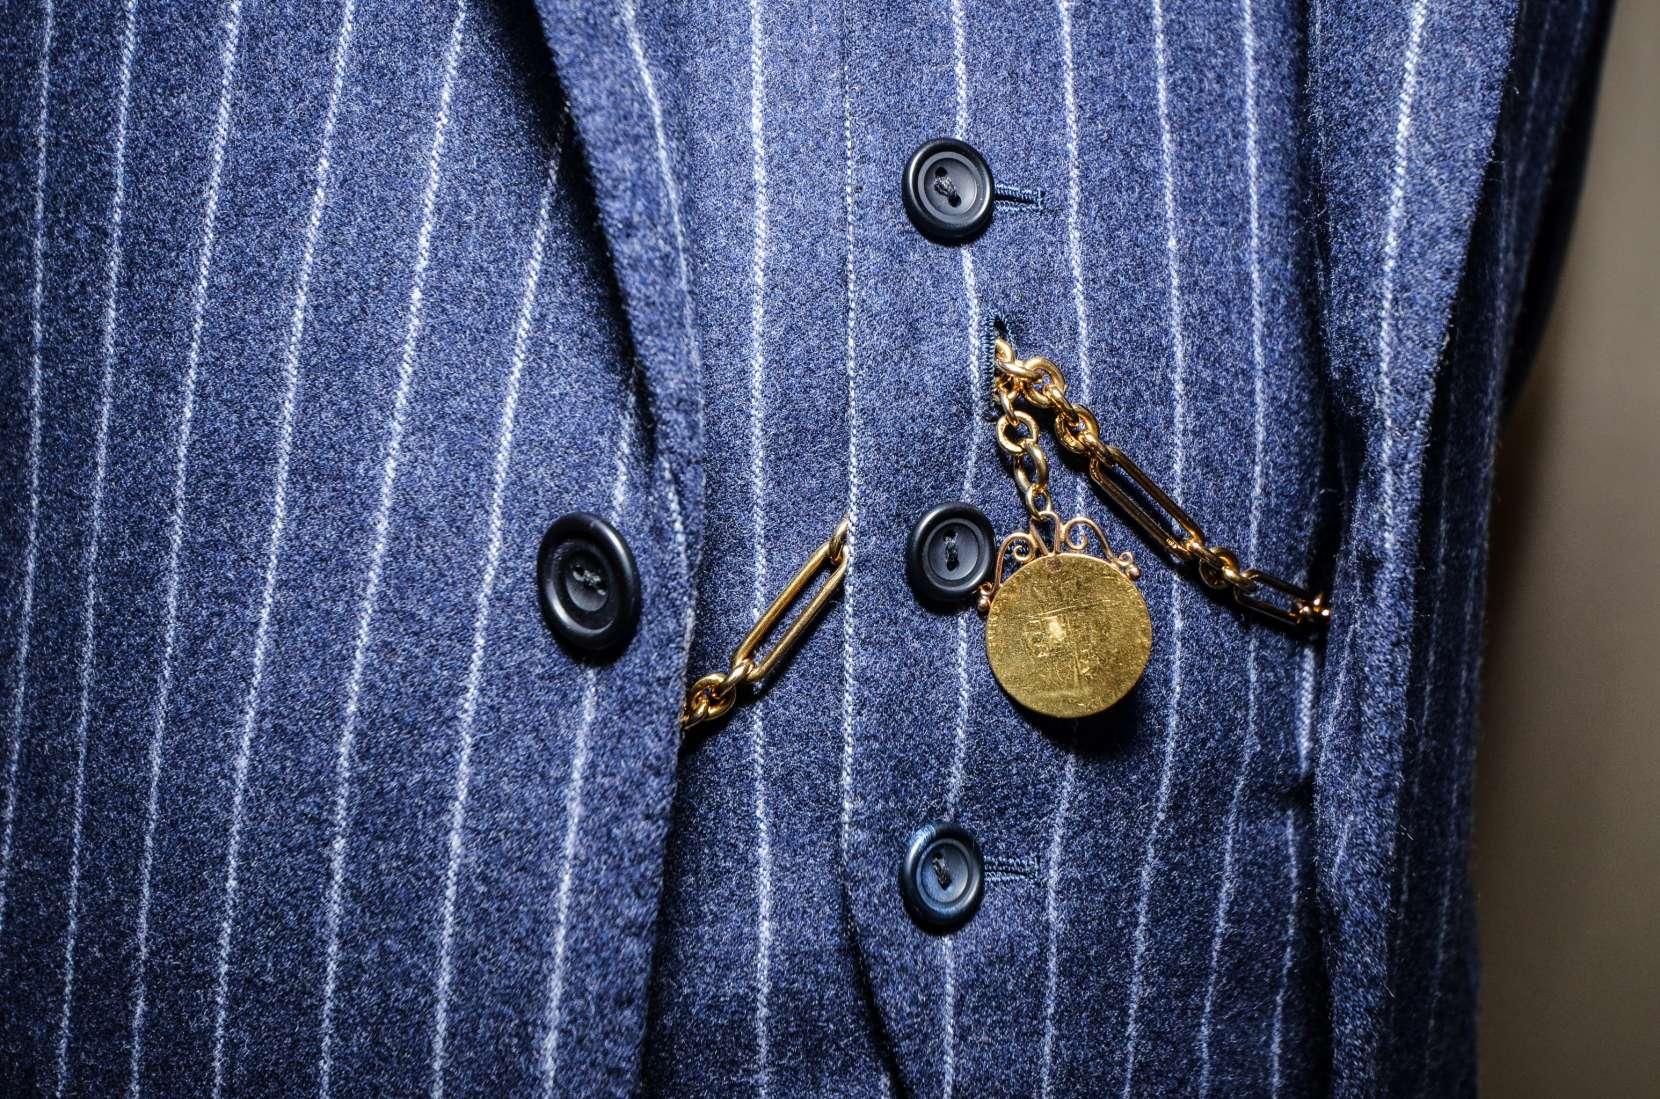 Garments-25-3-Piece-Blue-Chalk-Stripe-Suit-0563-1660x1099.jpg